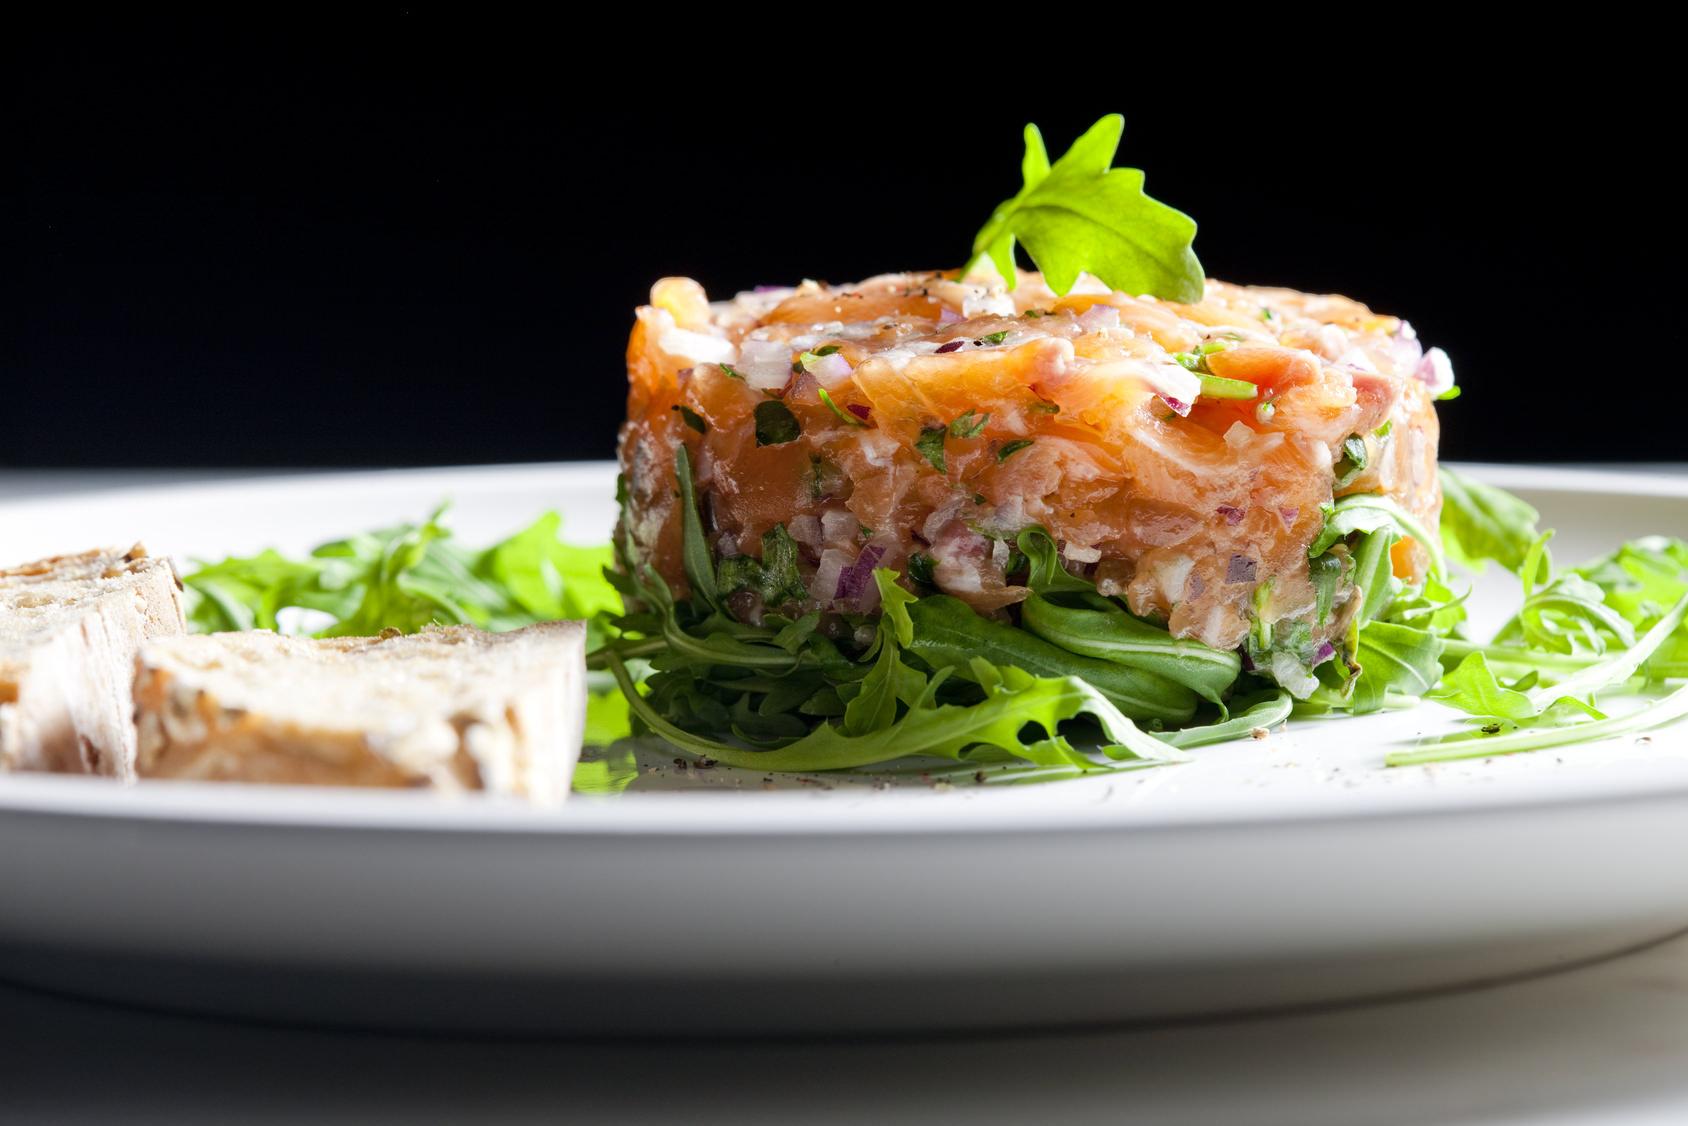 Tartare de saumon la coriandre une recette festive mais for Entree froide festive